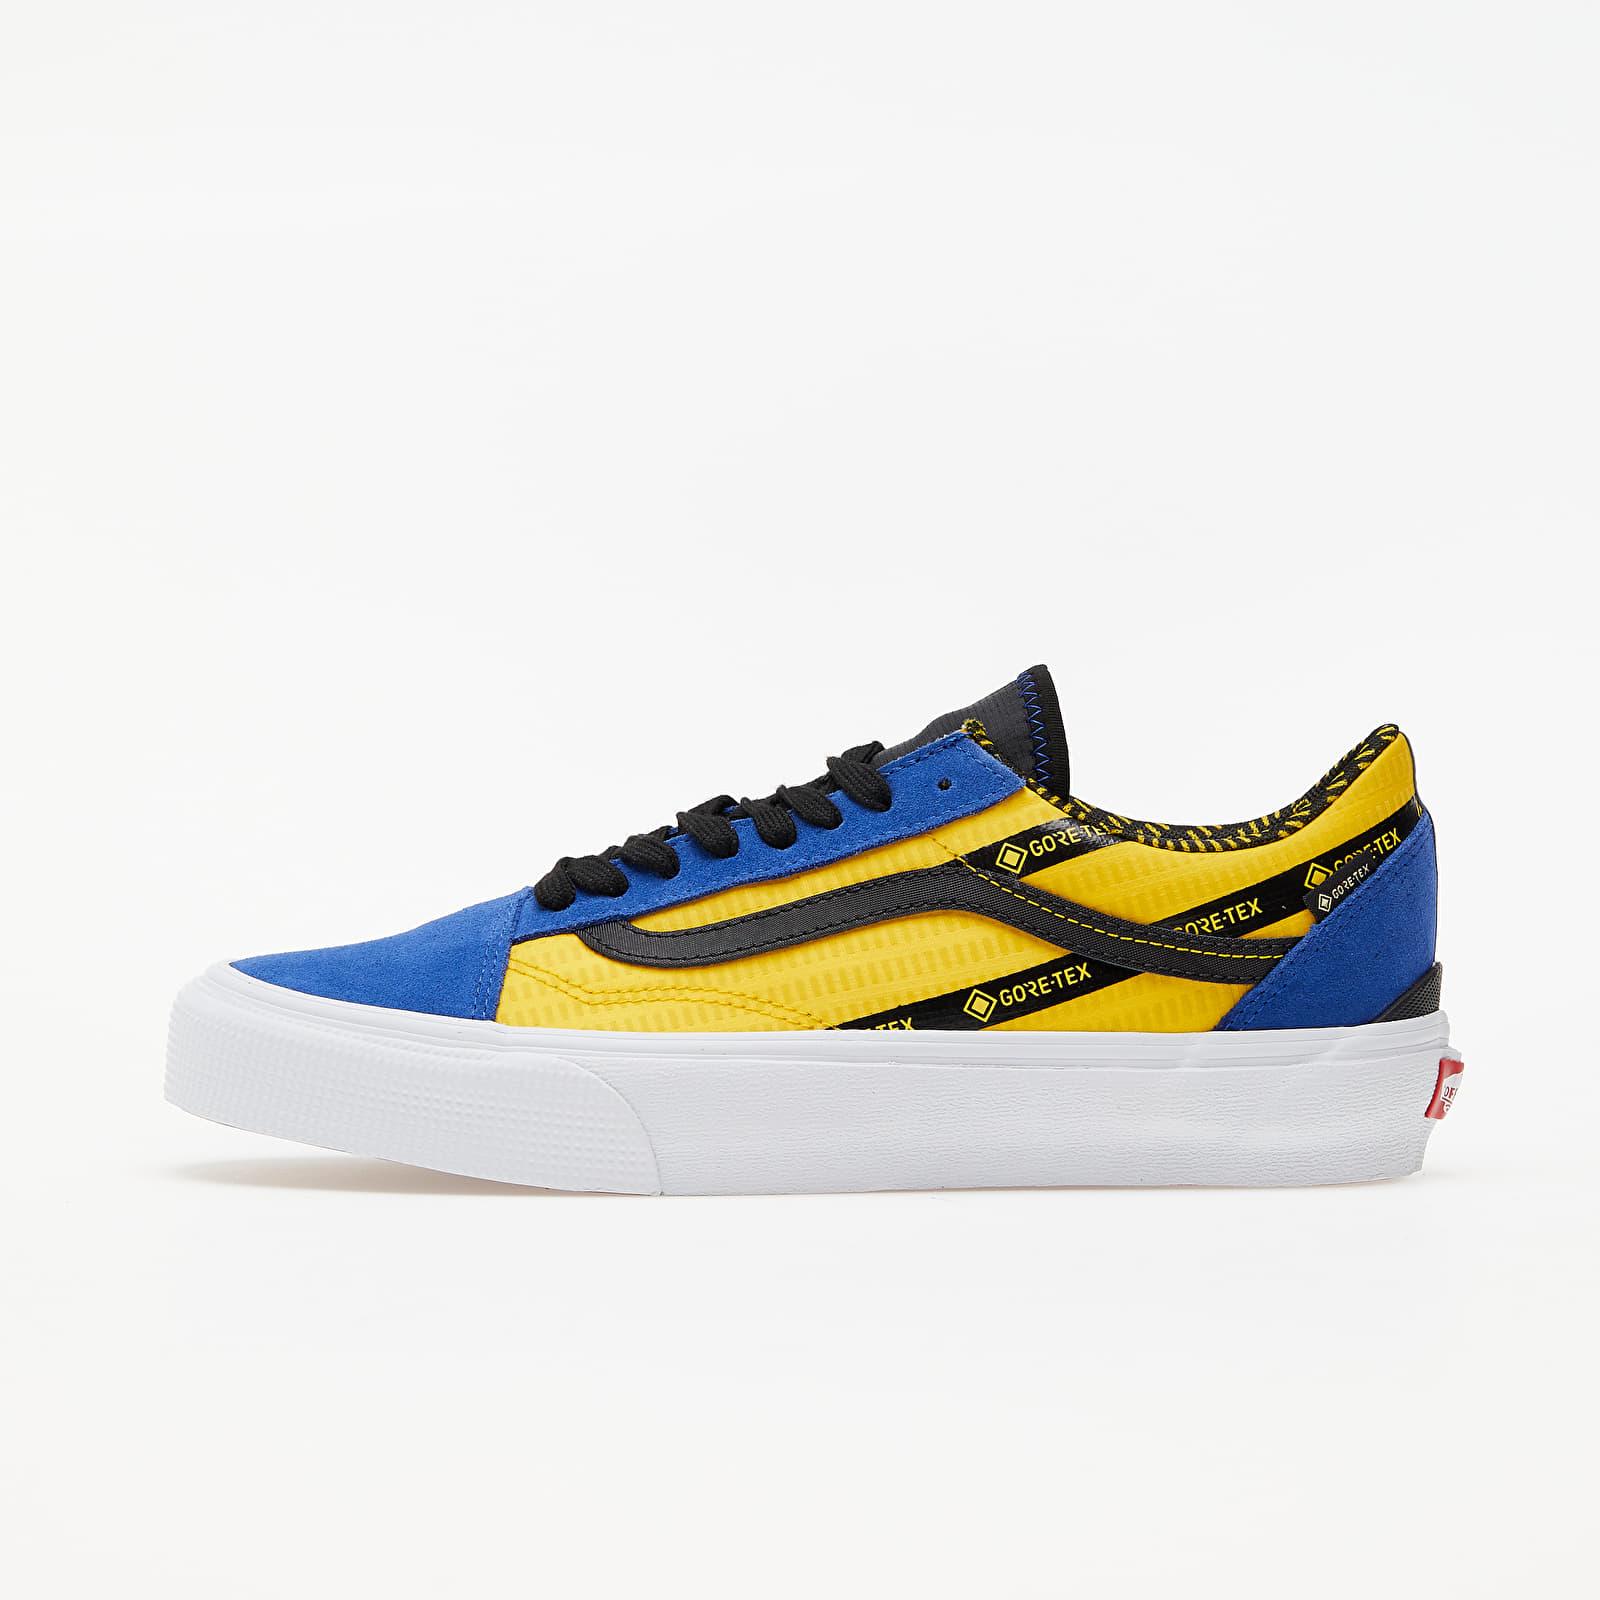 Pánske tenisky a topánky Vans Old Skool Gore-Tex (Gore-Tex) Blue/ Yellow